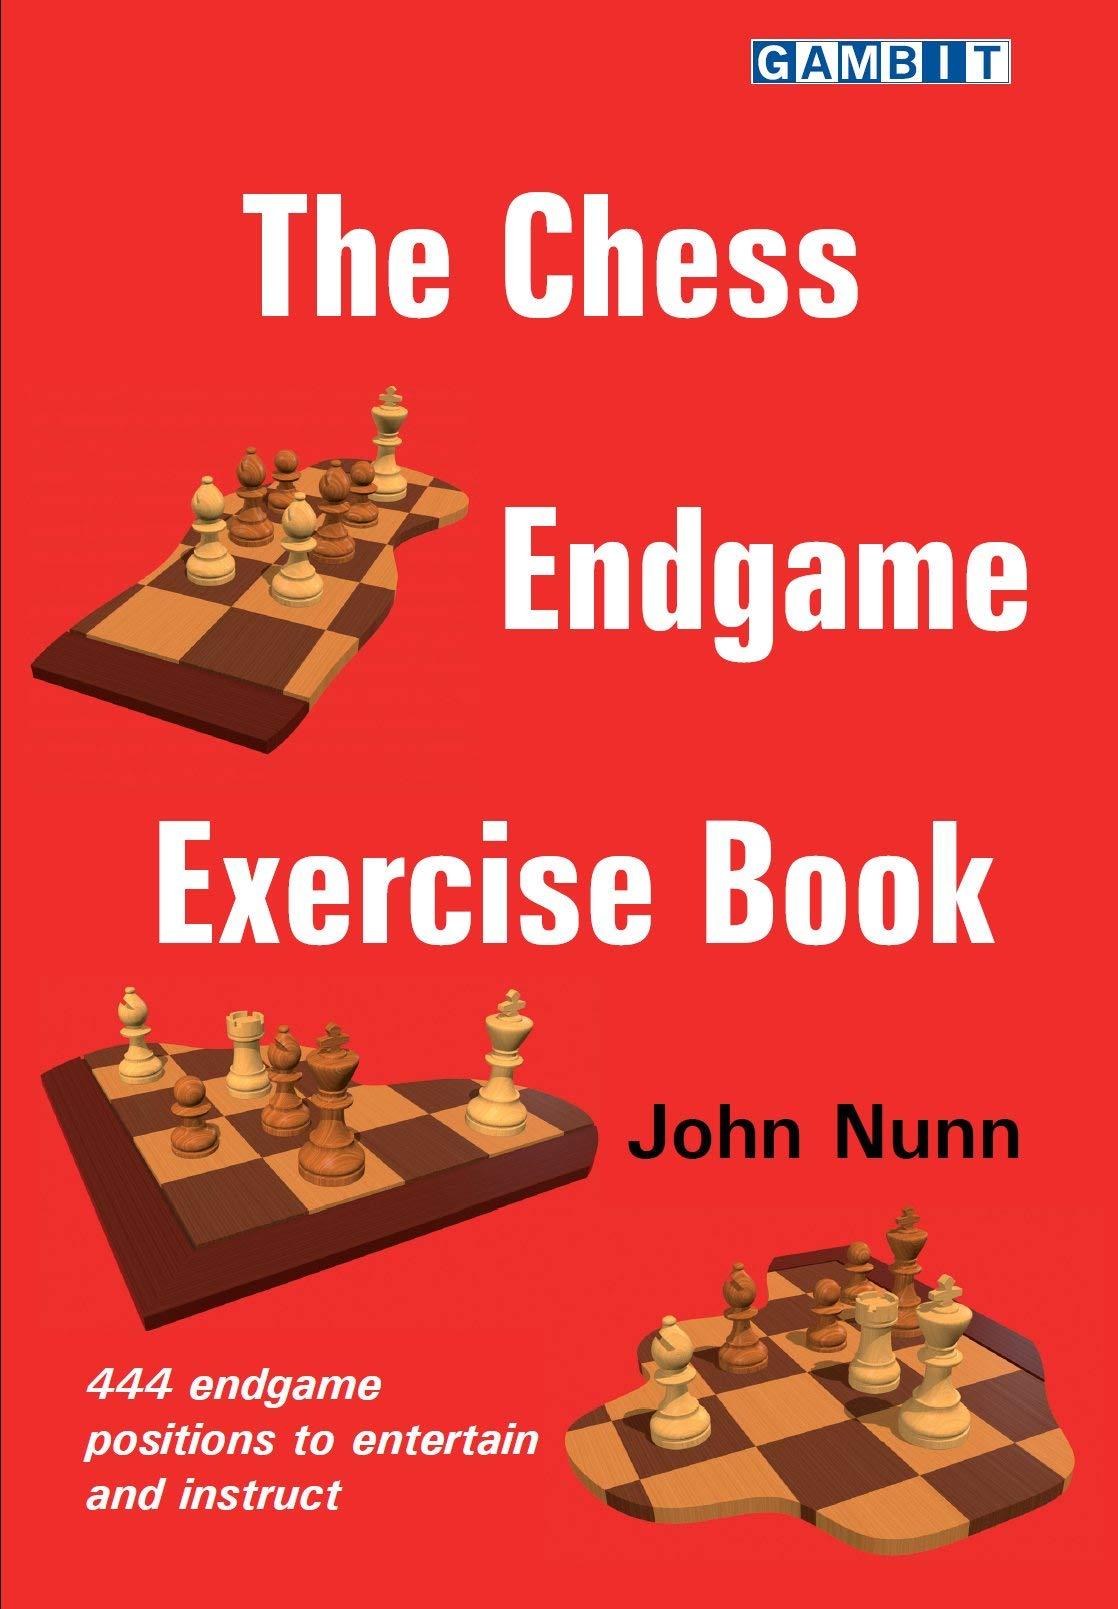 The Chess Endgame Exercise Book Paperback, JDM Nunn, Gambit Publications Ltd., 2020